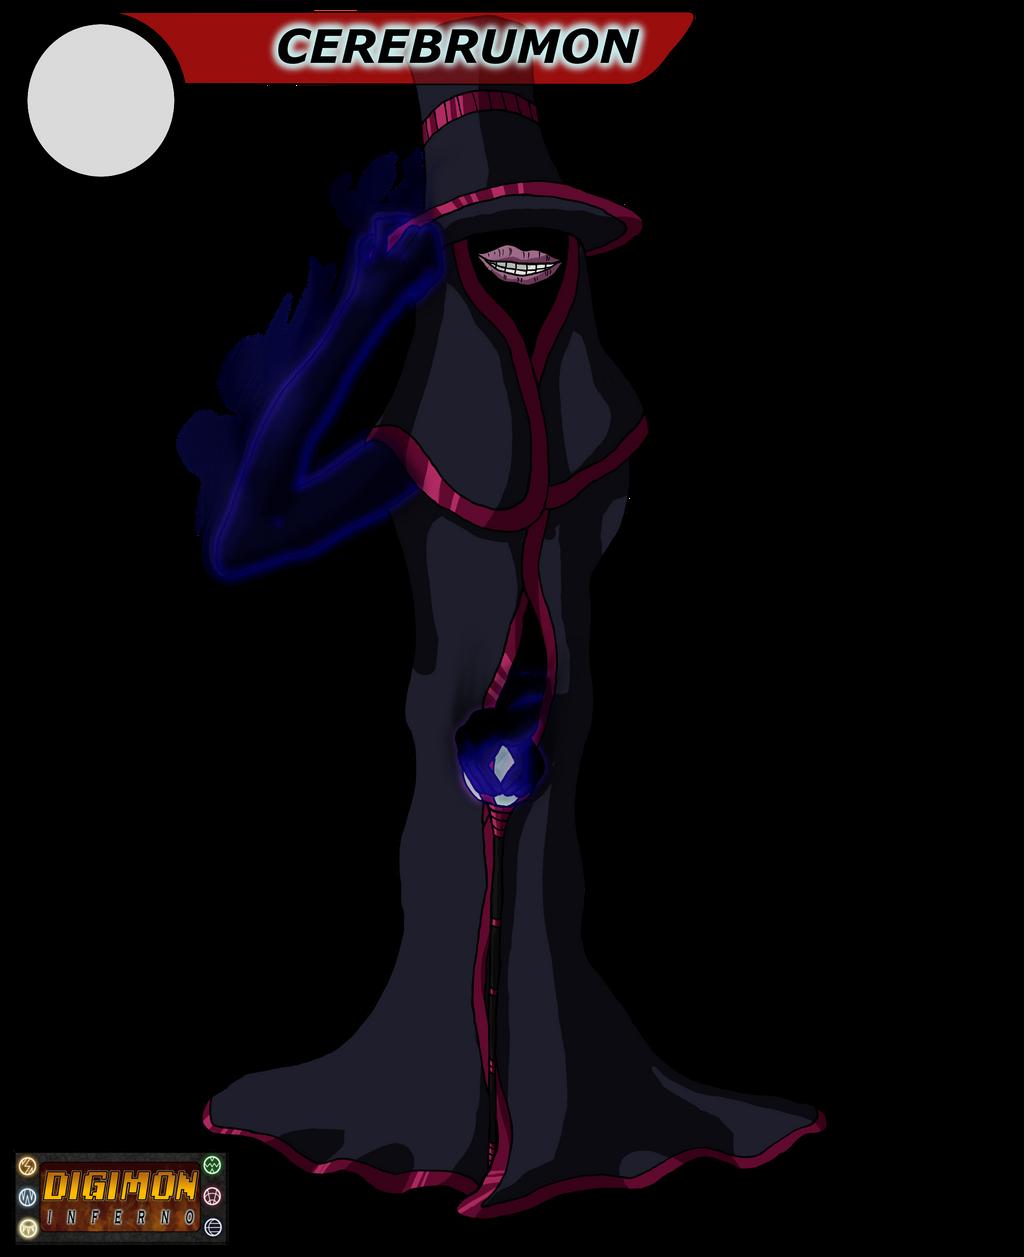 Digimon Inferno: Cerebrumon by BlackHawkNova